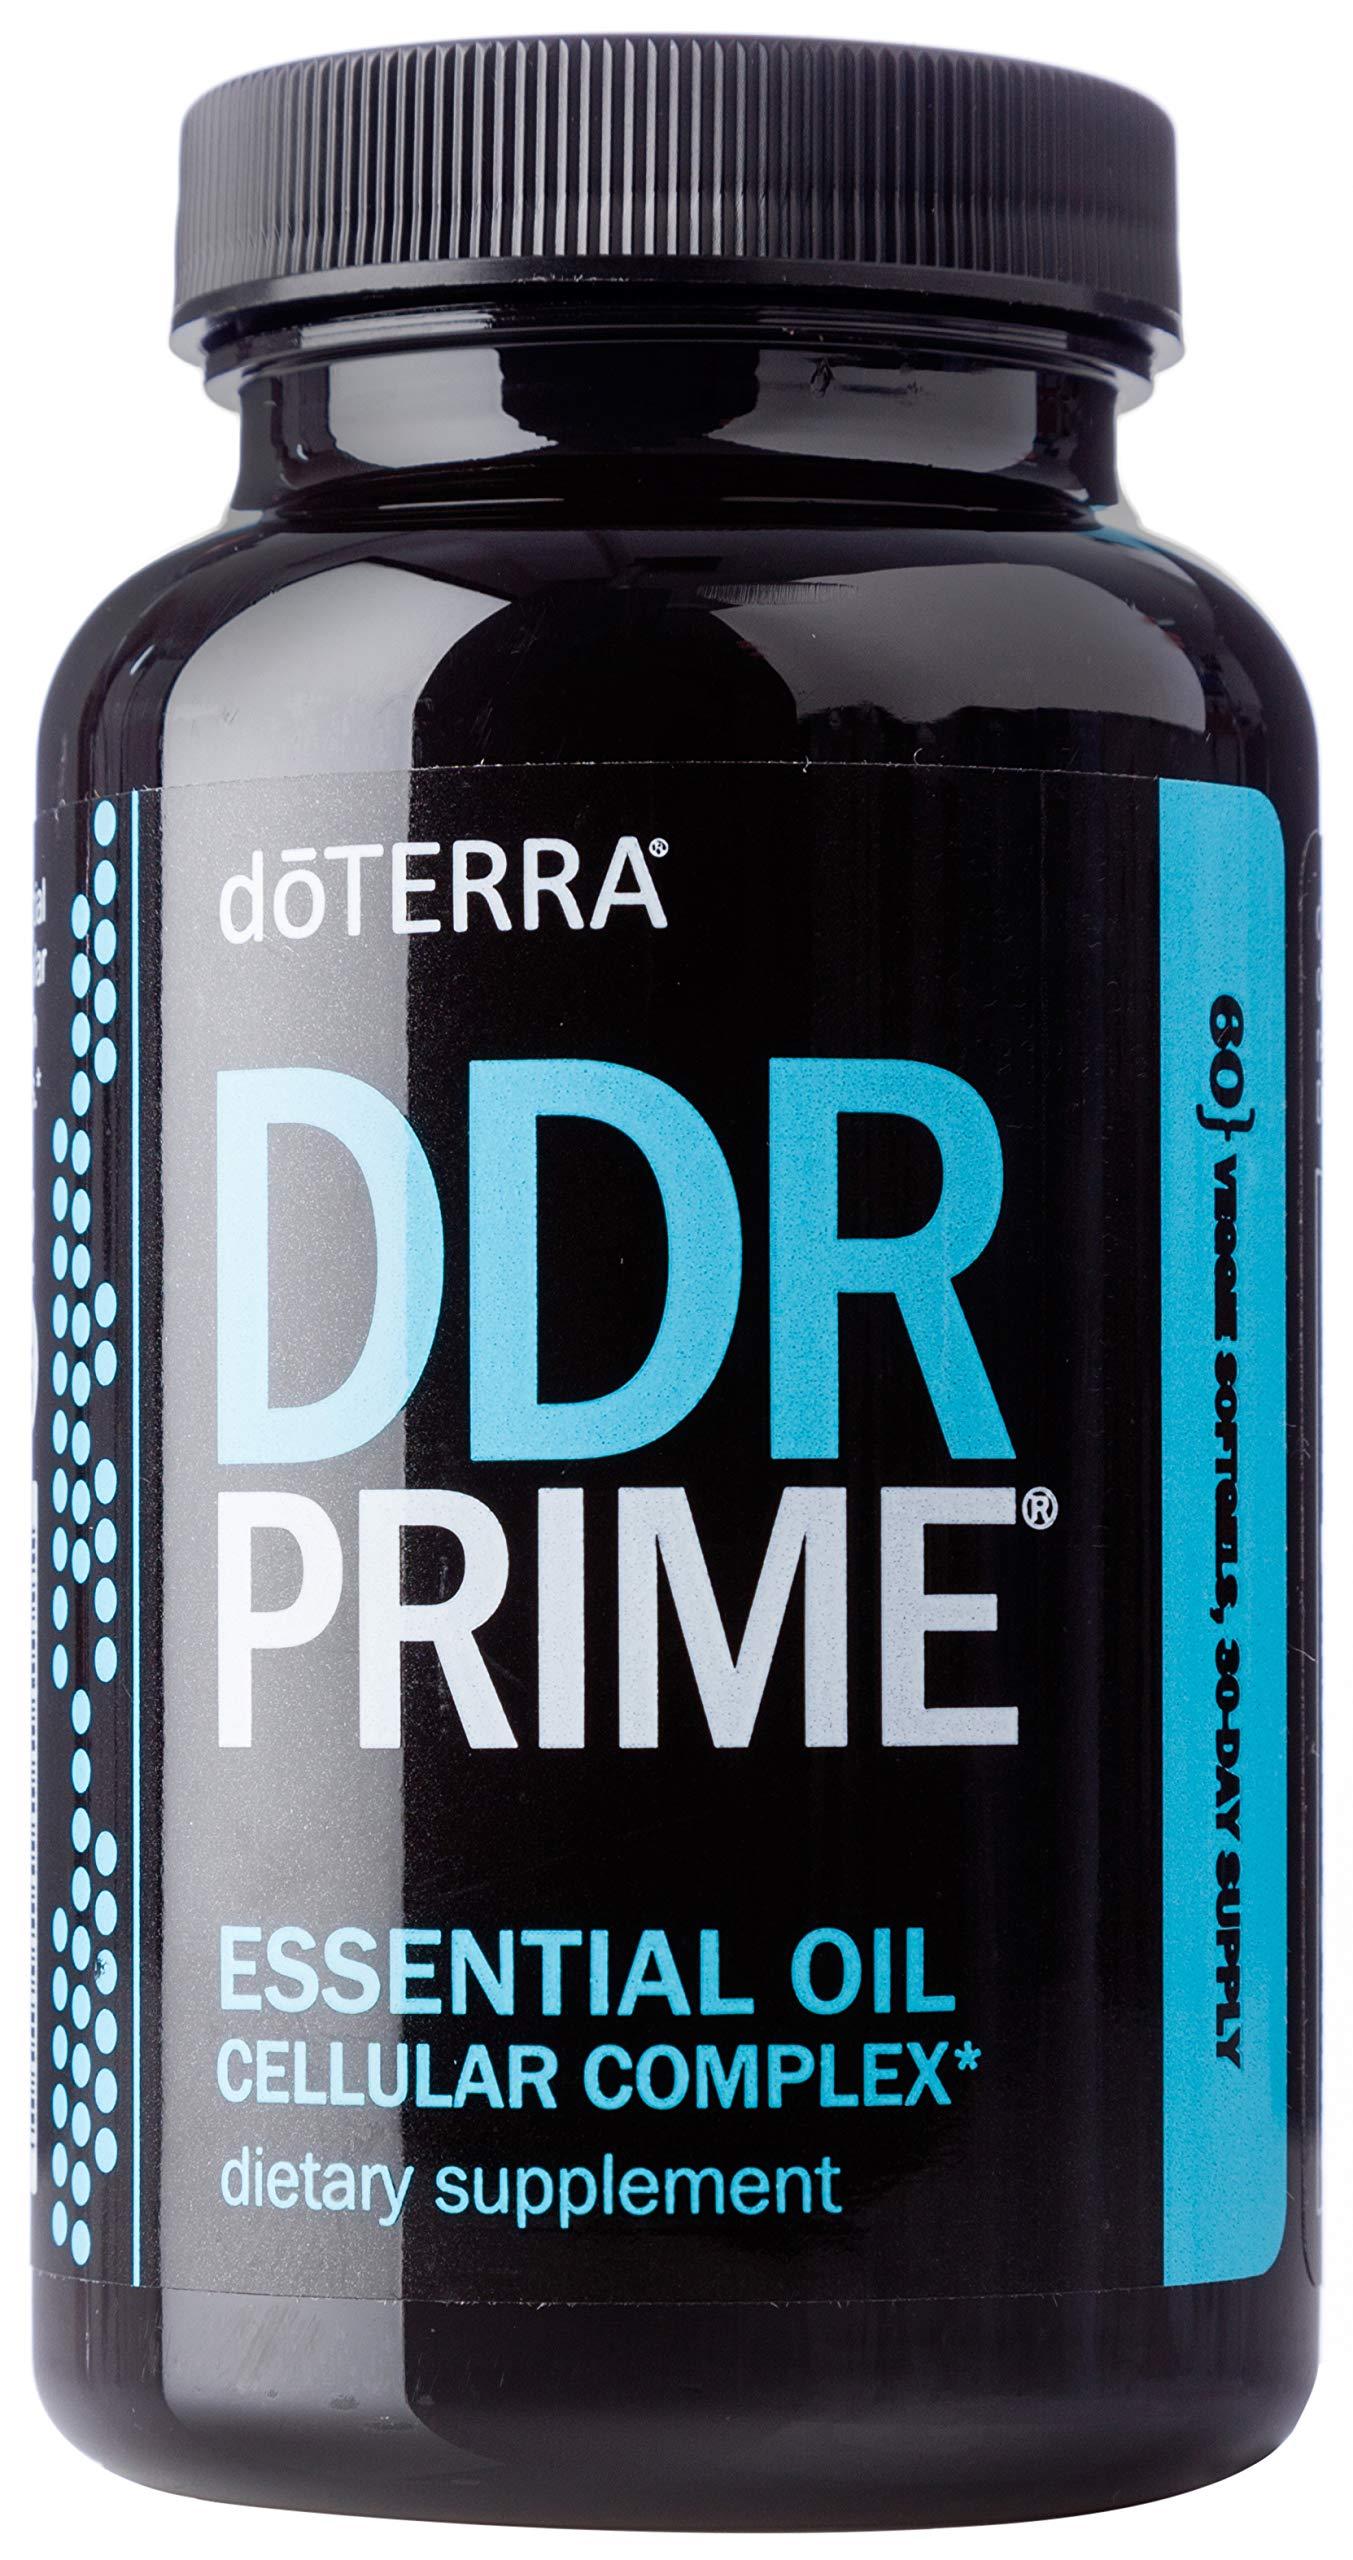 doTERRA - DDR Prime Softgels Essential Oil Complex - 60 Softgels